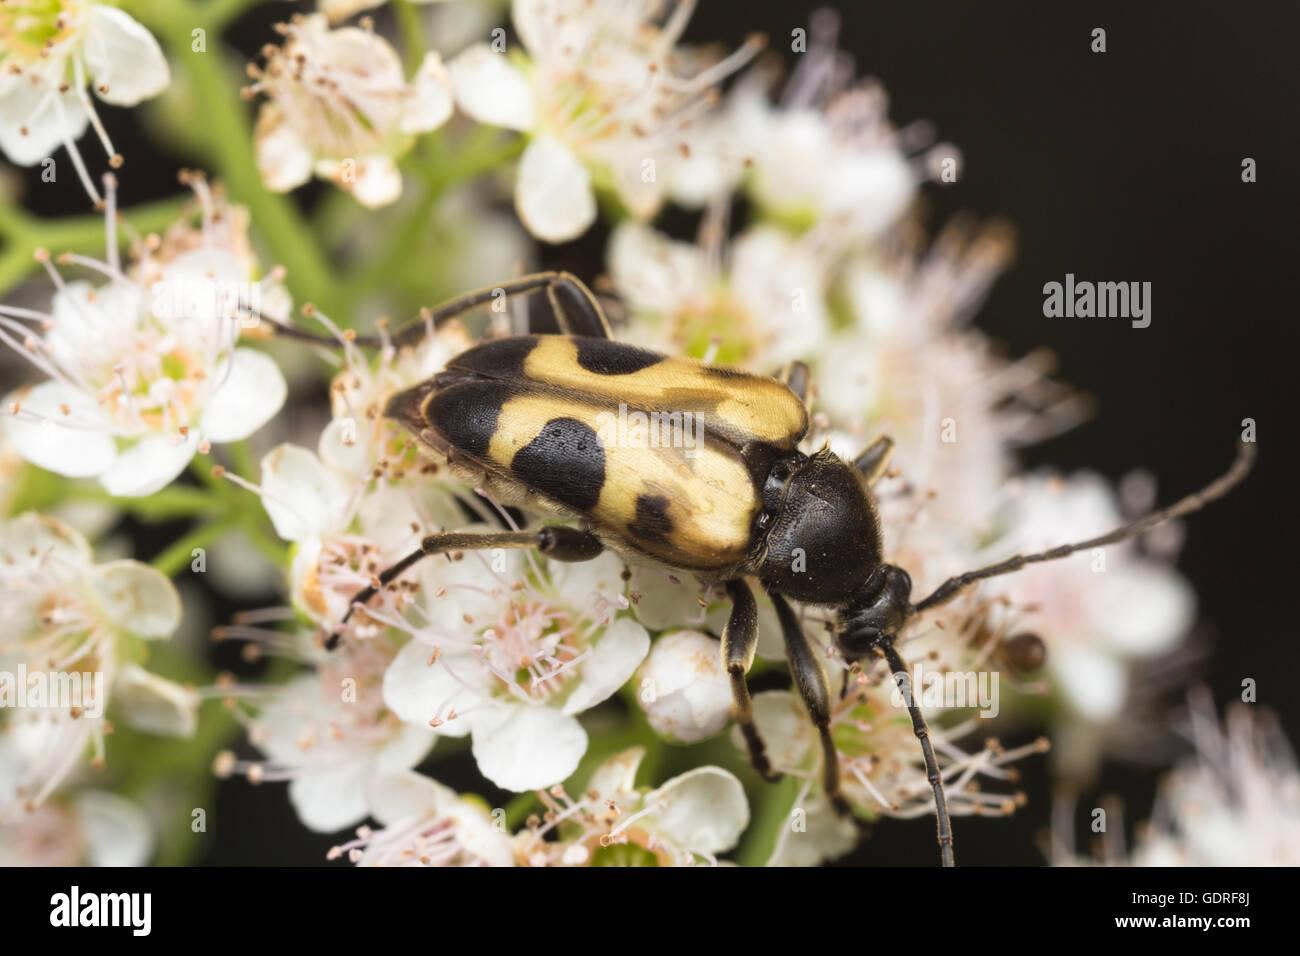 A Flower Longhorn beetle (Judolia cordifera) feeds on pollen. - Stock Image